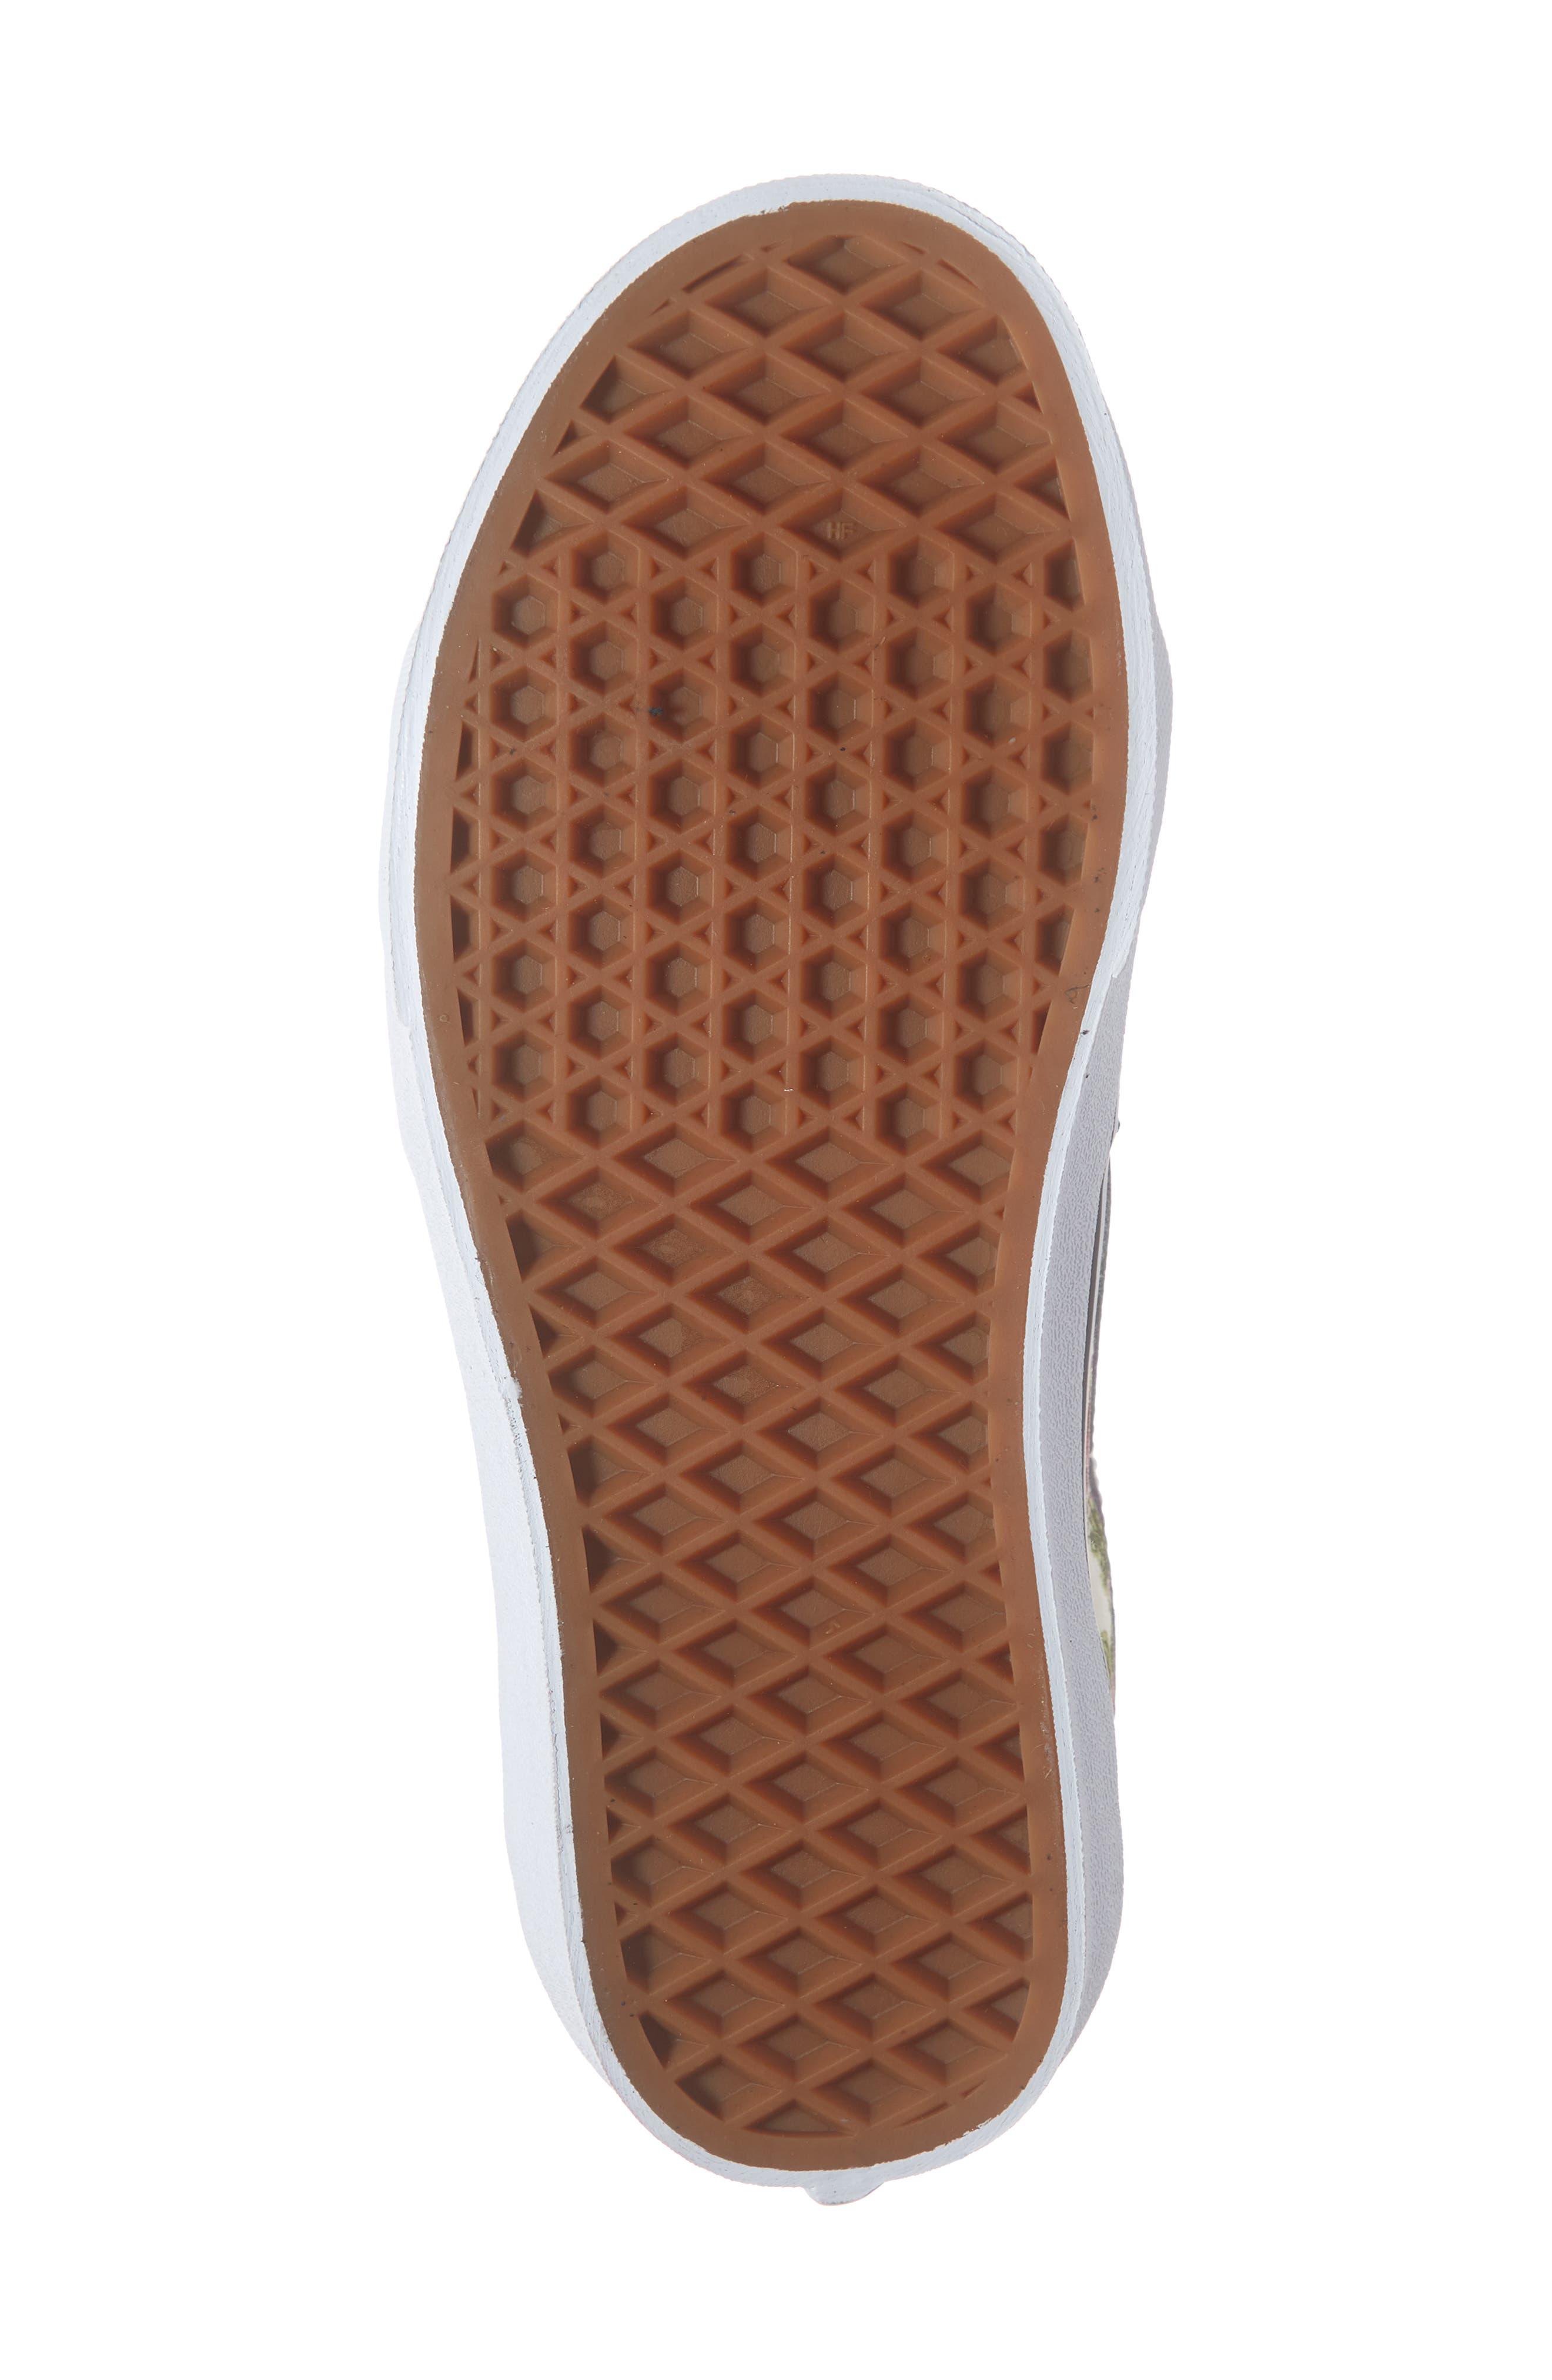 VANS, Sk8-Hi Floral Sneaker, Alternate thumbnail 6, color, FLORAL MULTI/ TRUE WHITE